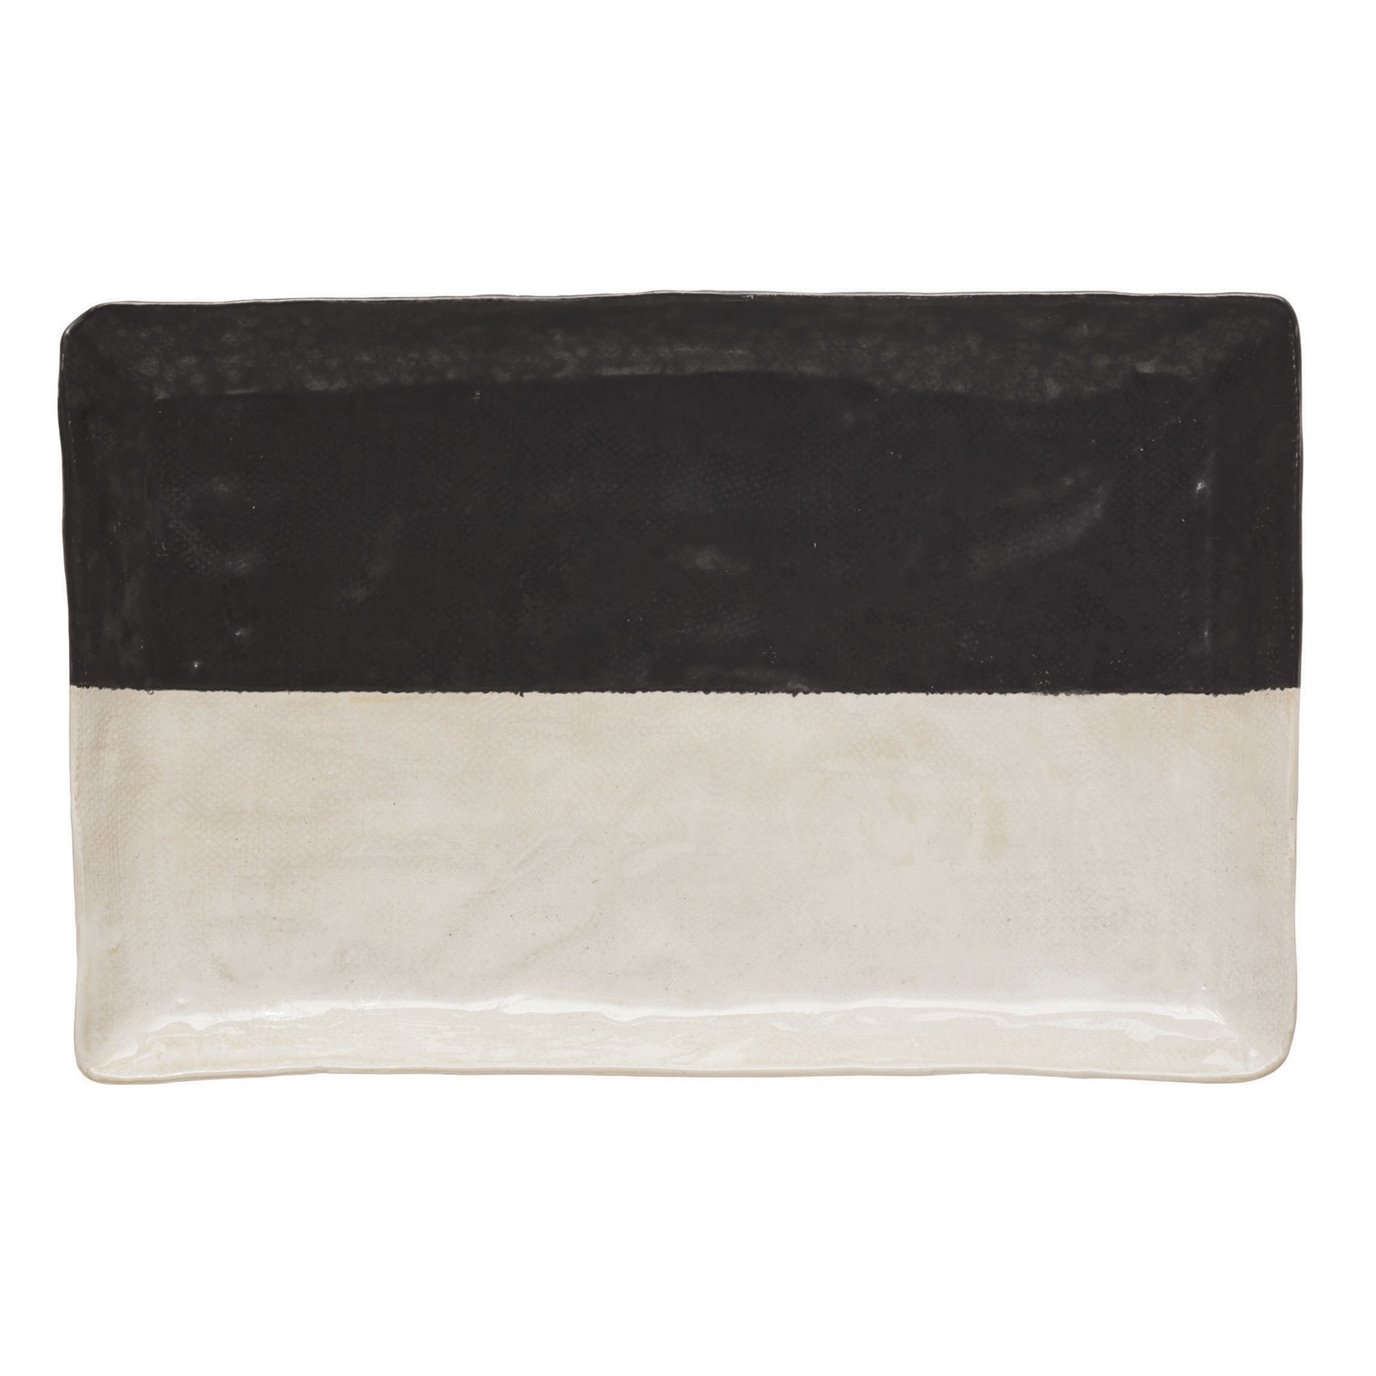 Stoneware Platter, Black & White (Each One Will Vary)